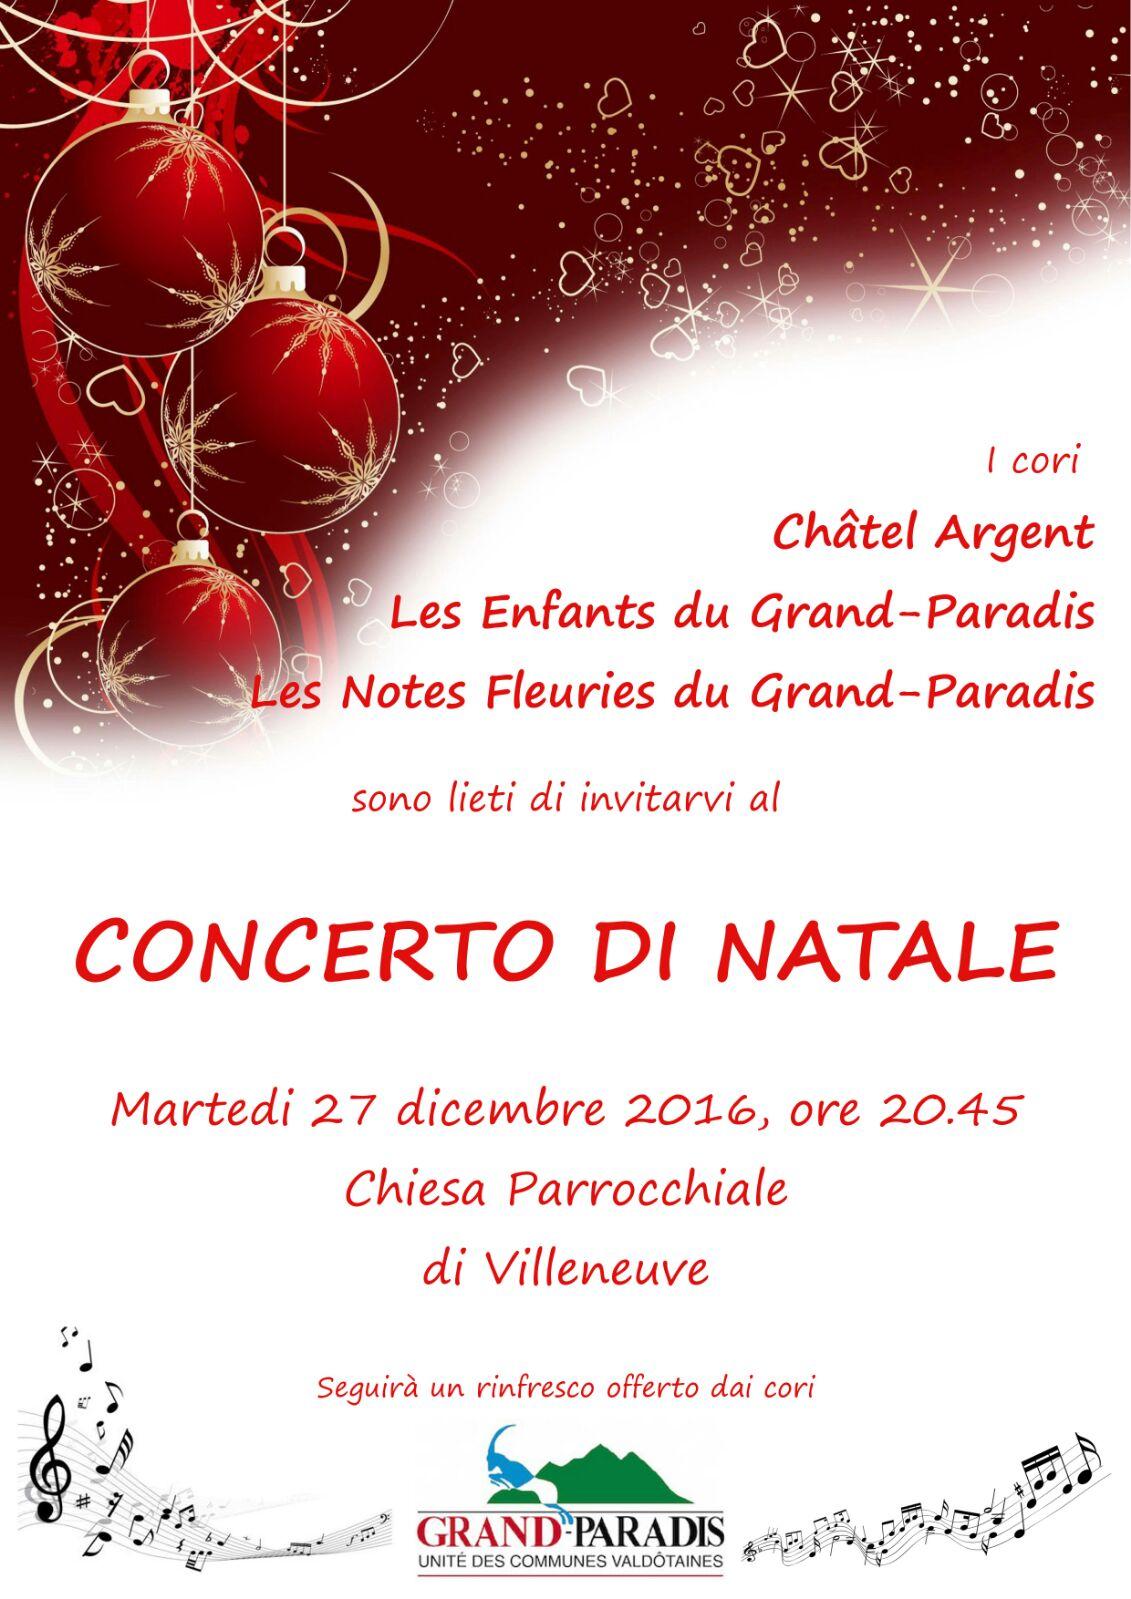 concerto-di-nalate